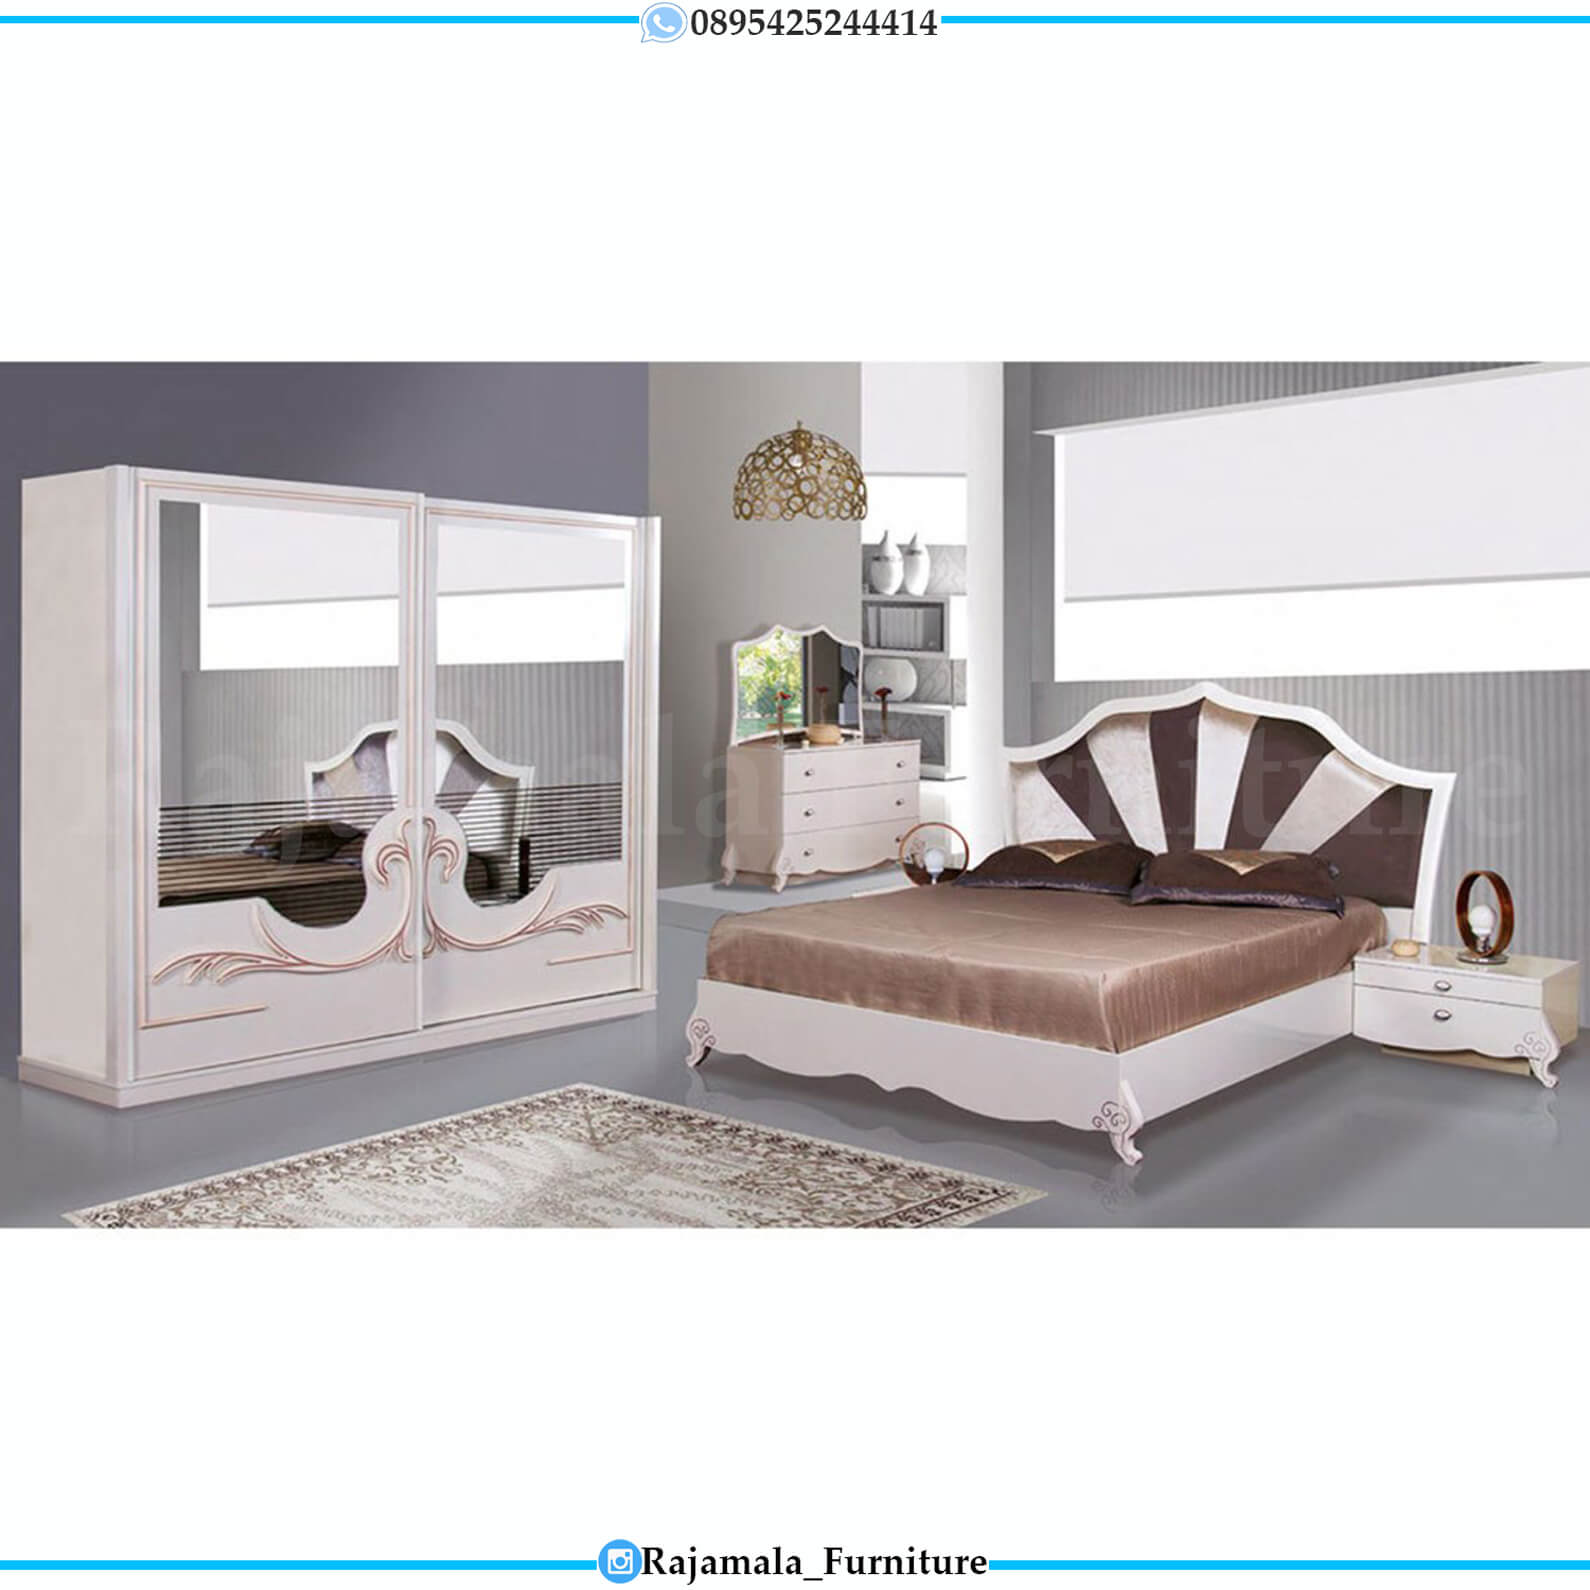 New Set Tempat Tidur Minimalis Luxury Concept Rajamala Furniture RM-0224